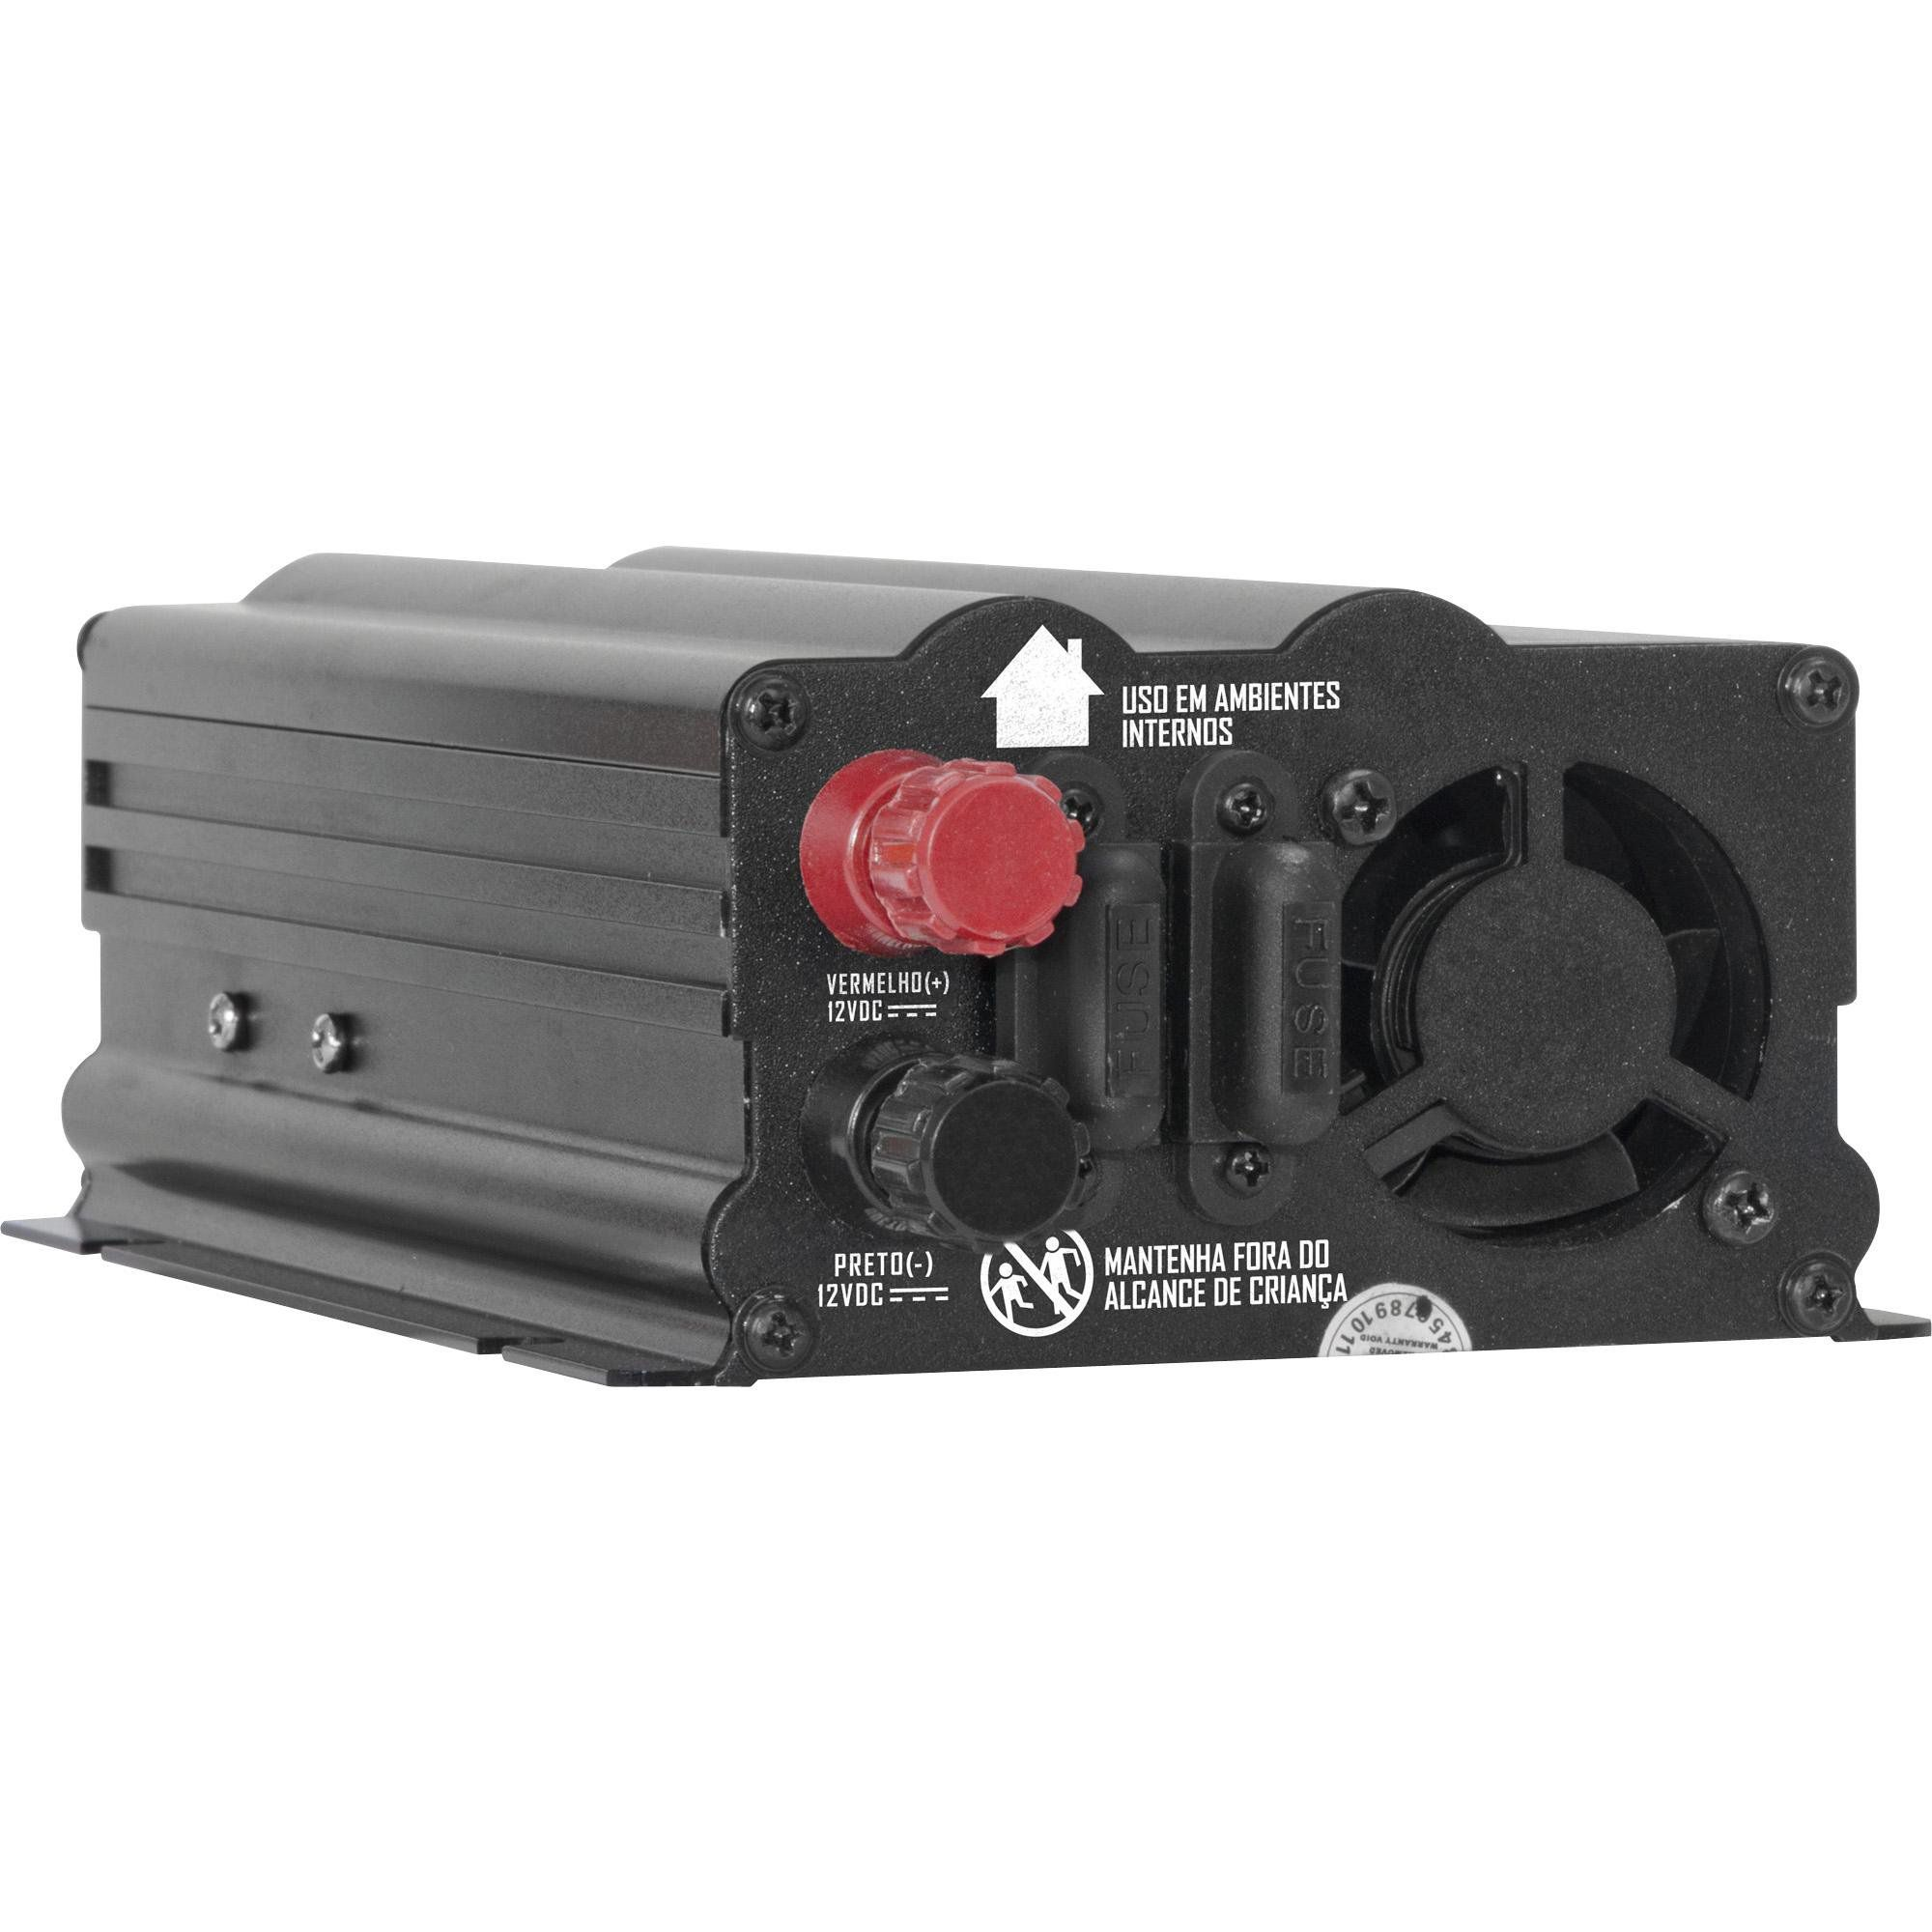 INVERSOR HAYONIC 500W 12VDC220V USB ONDA MODIFICADA GD